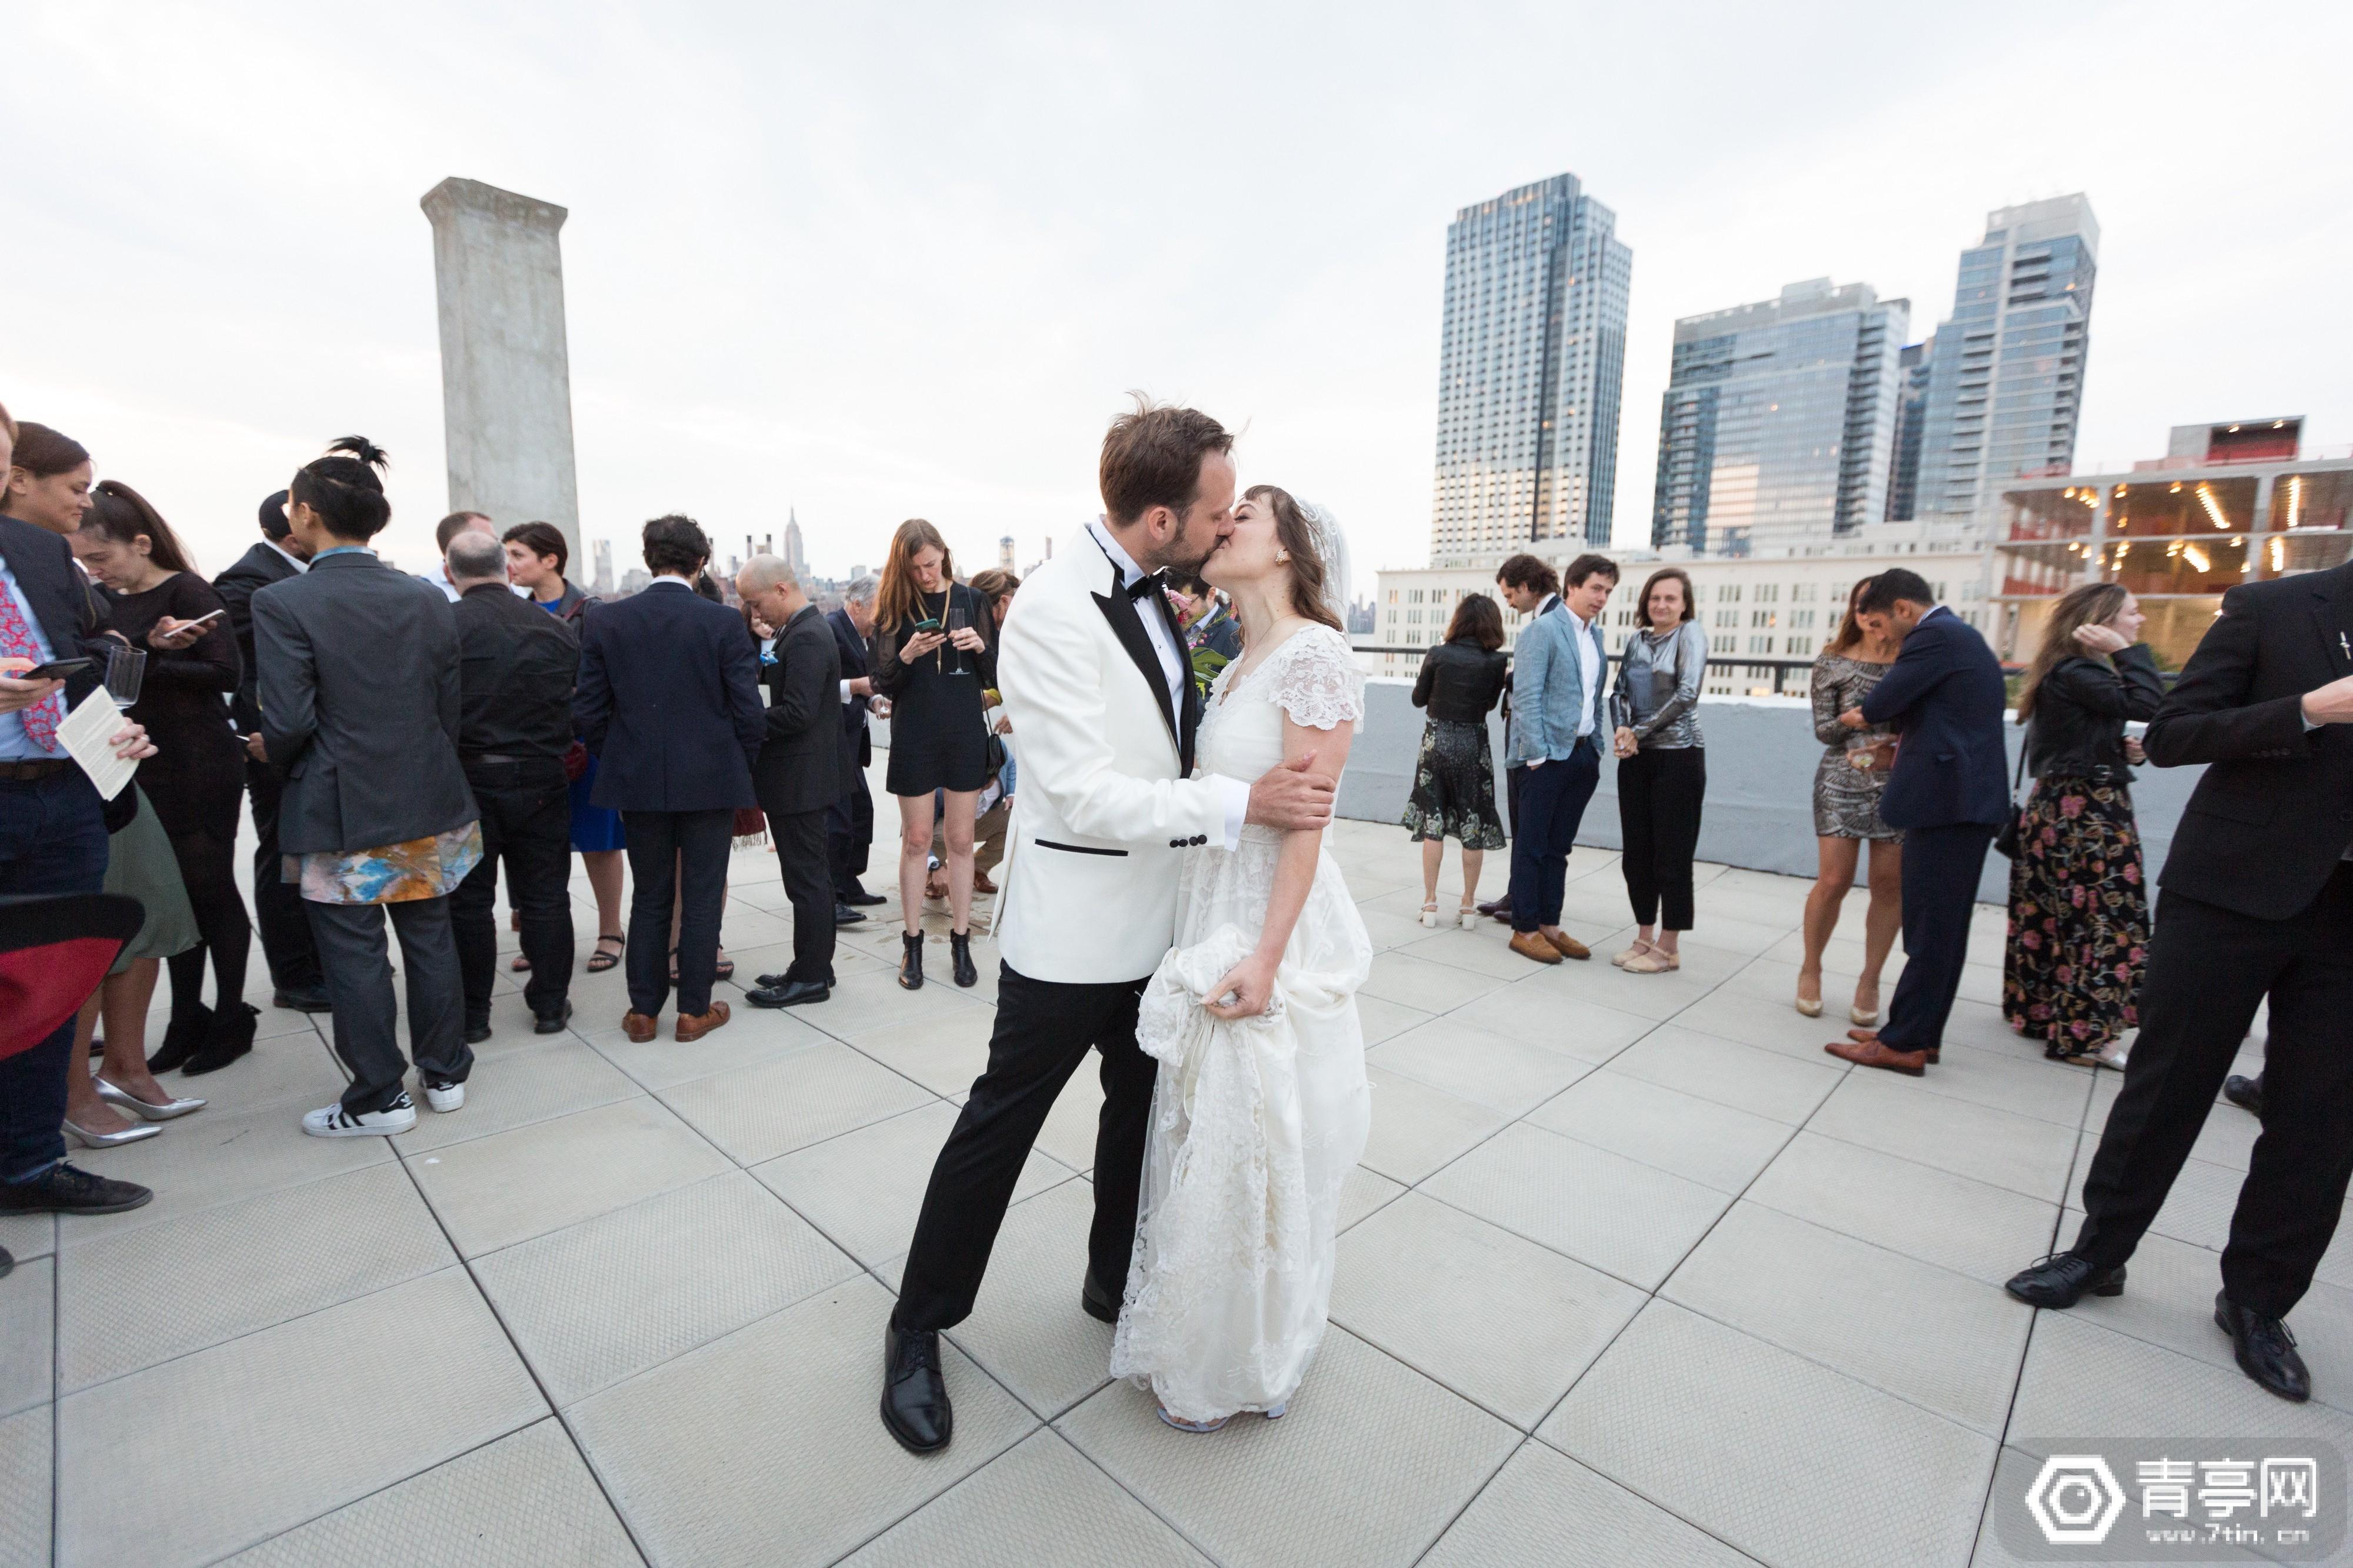 2D拍照out了,试试用全息摄影记录你的婚礼现场